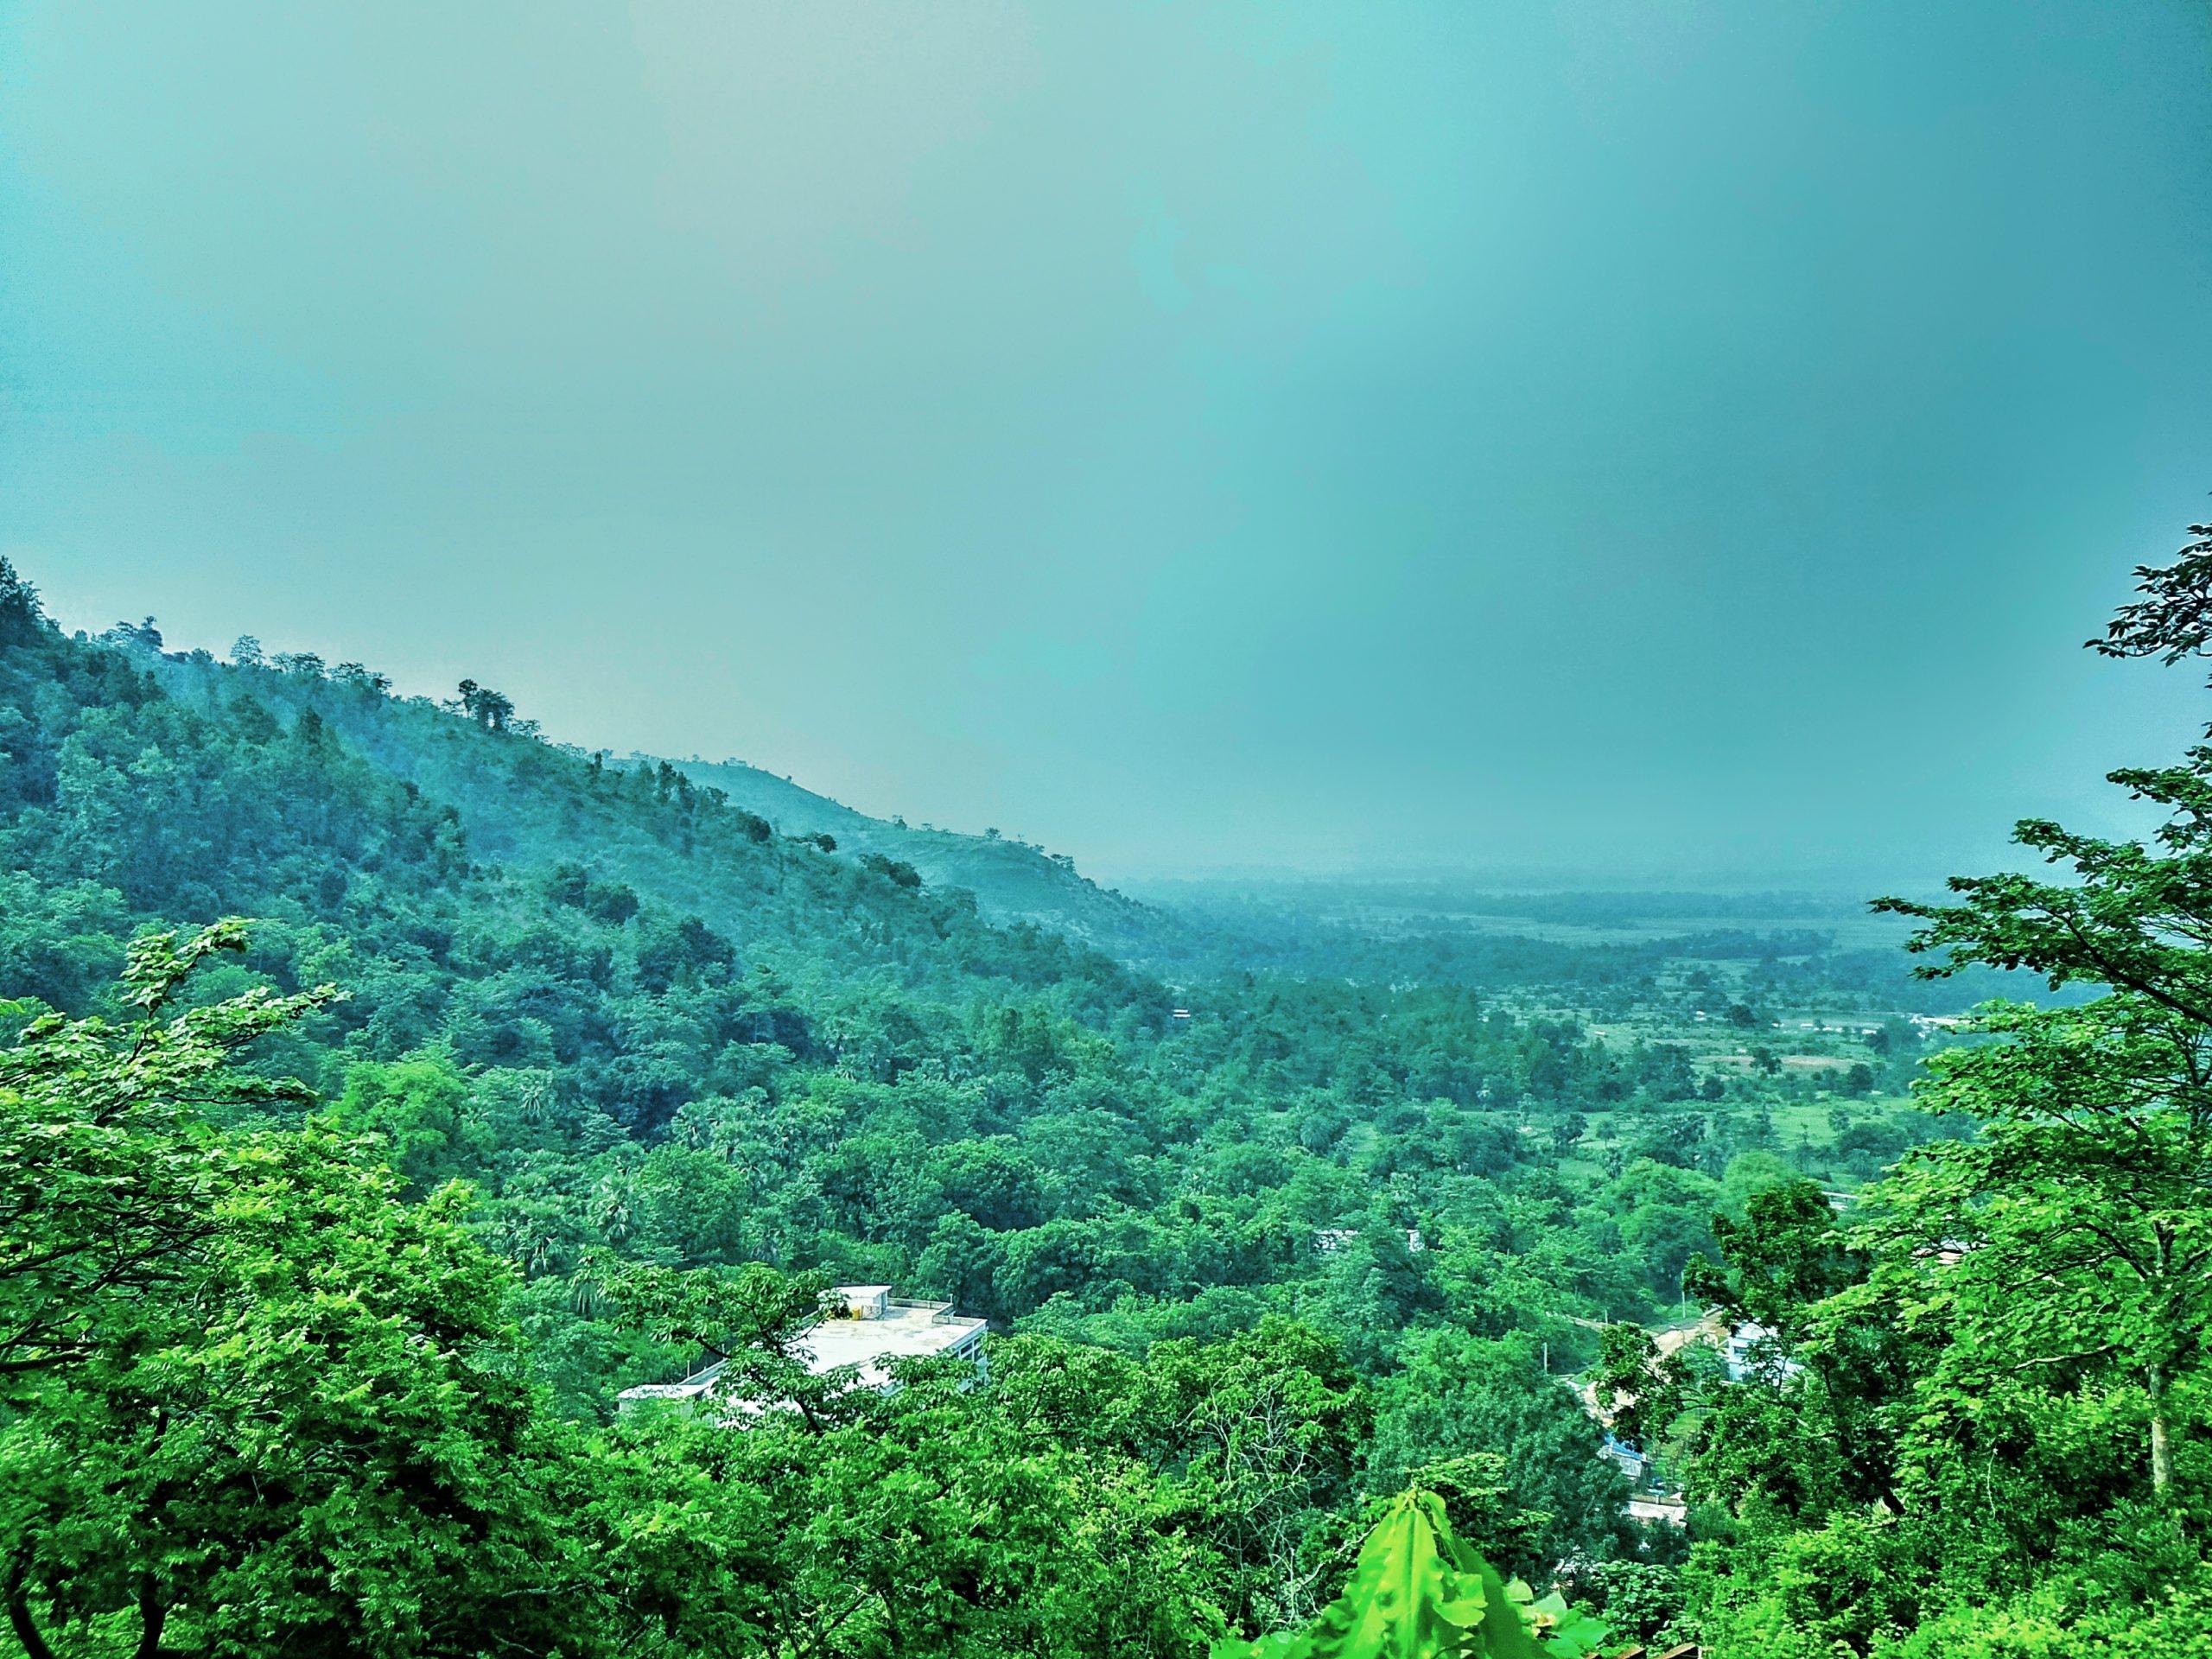 Mountain Sky View